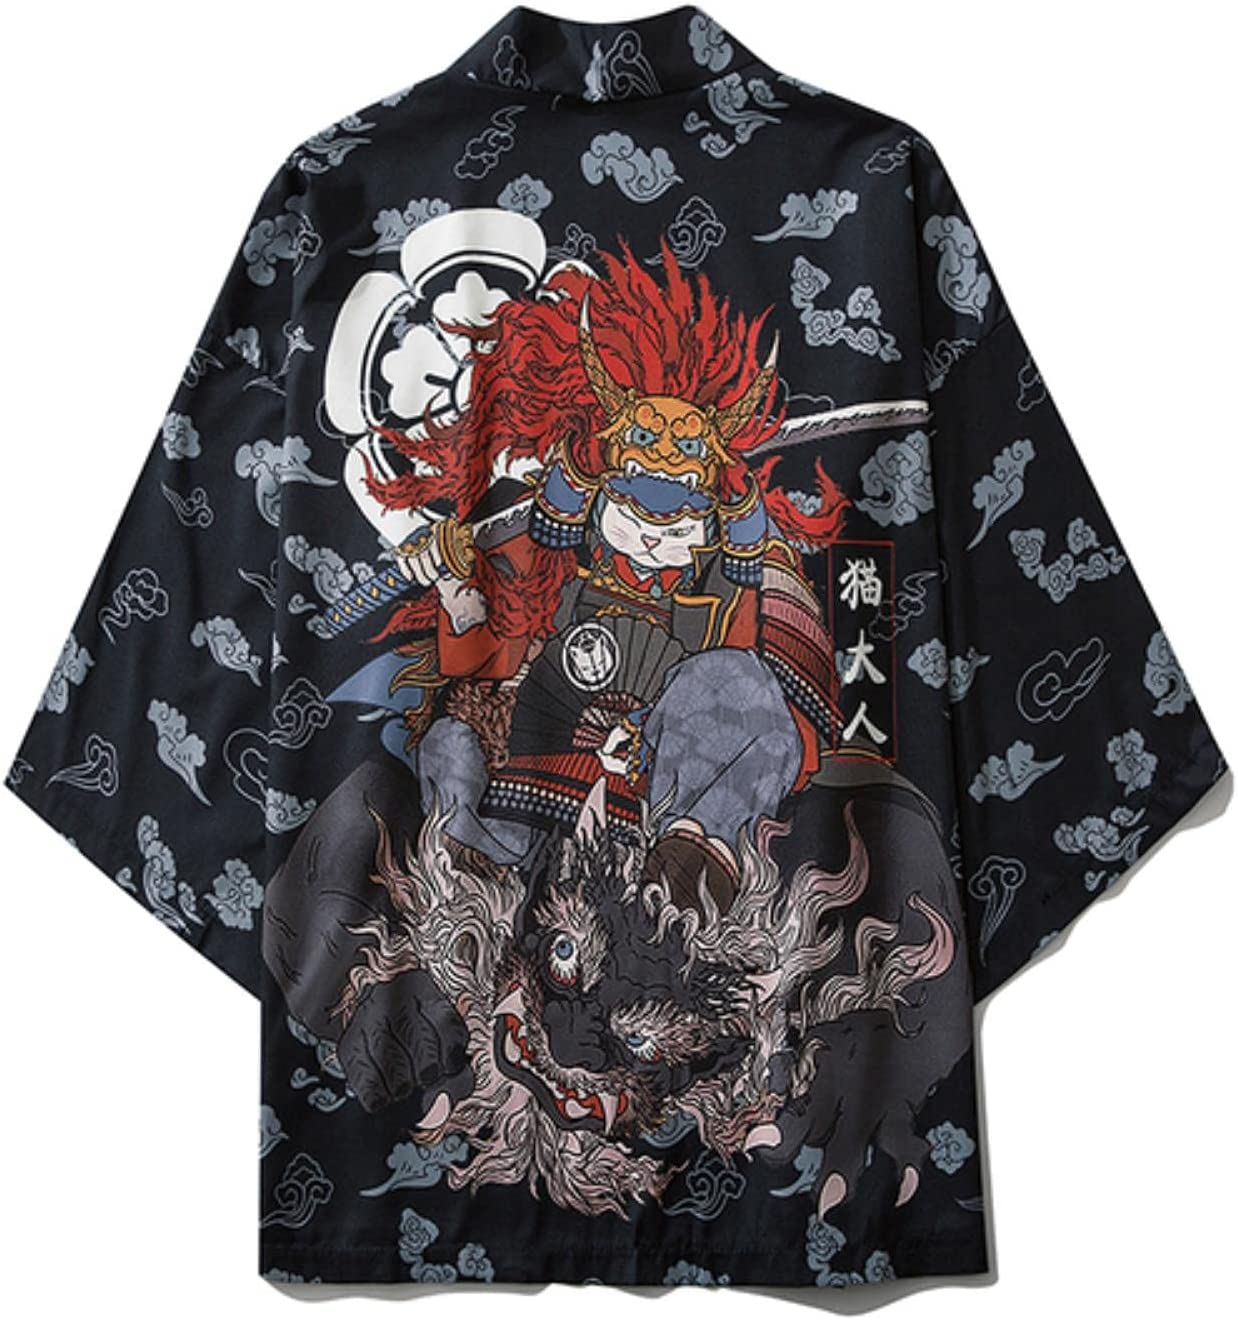 Traditional Japanese Samurai Cat Kimonos Cardigan Robe Men Summer Women Yukata Haori Casual Cosplay Anime Clothing